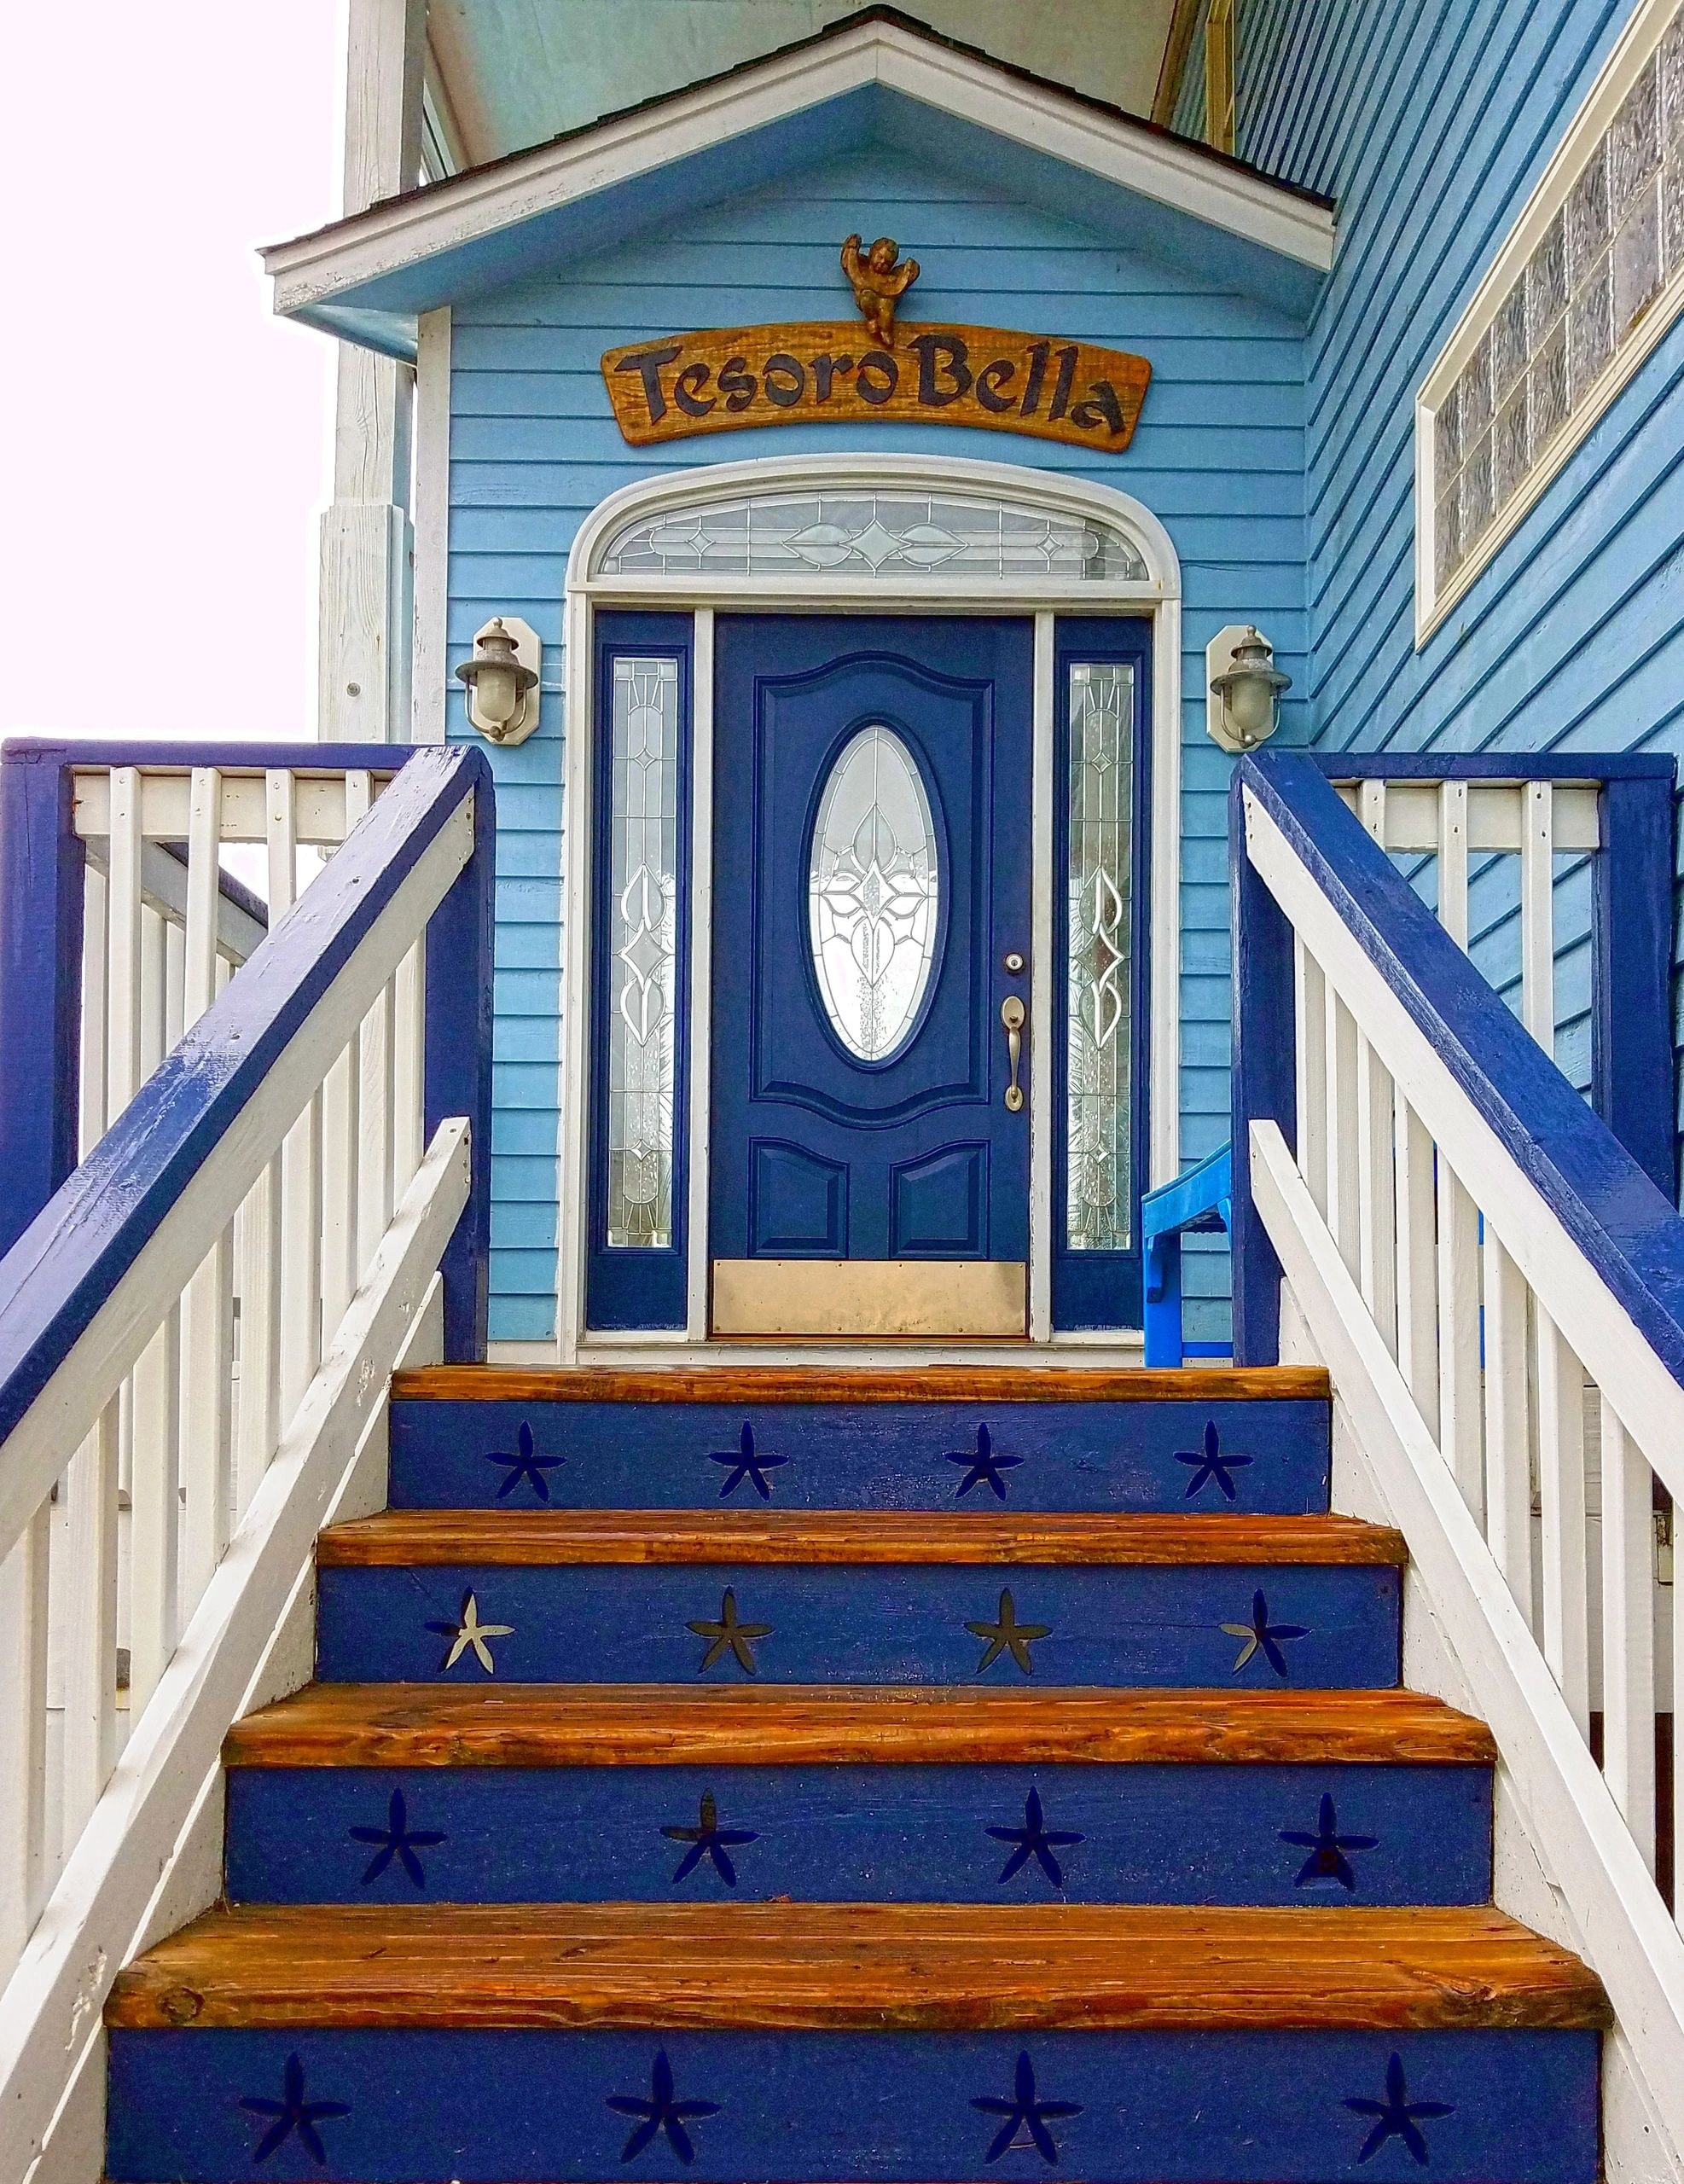 Tesoro Bella front entrance